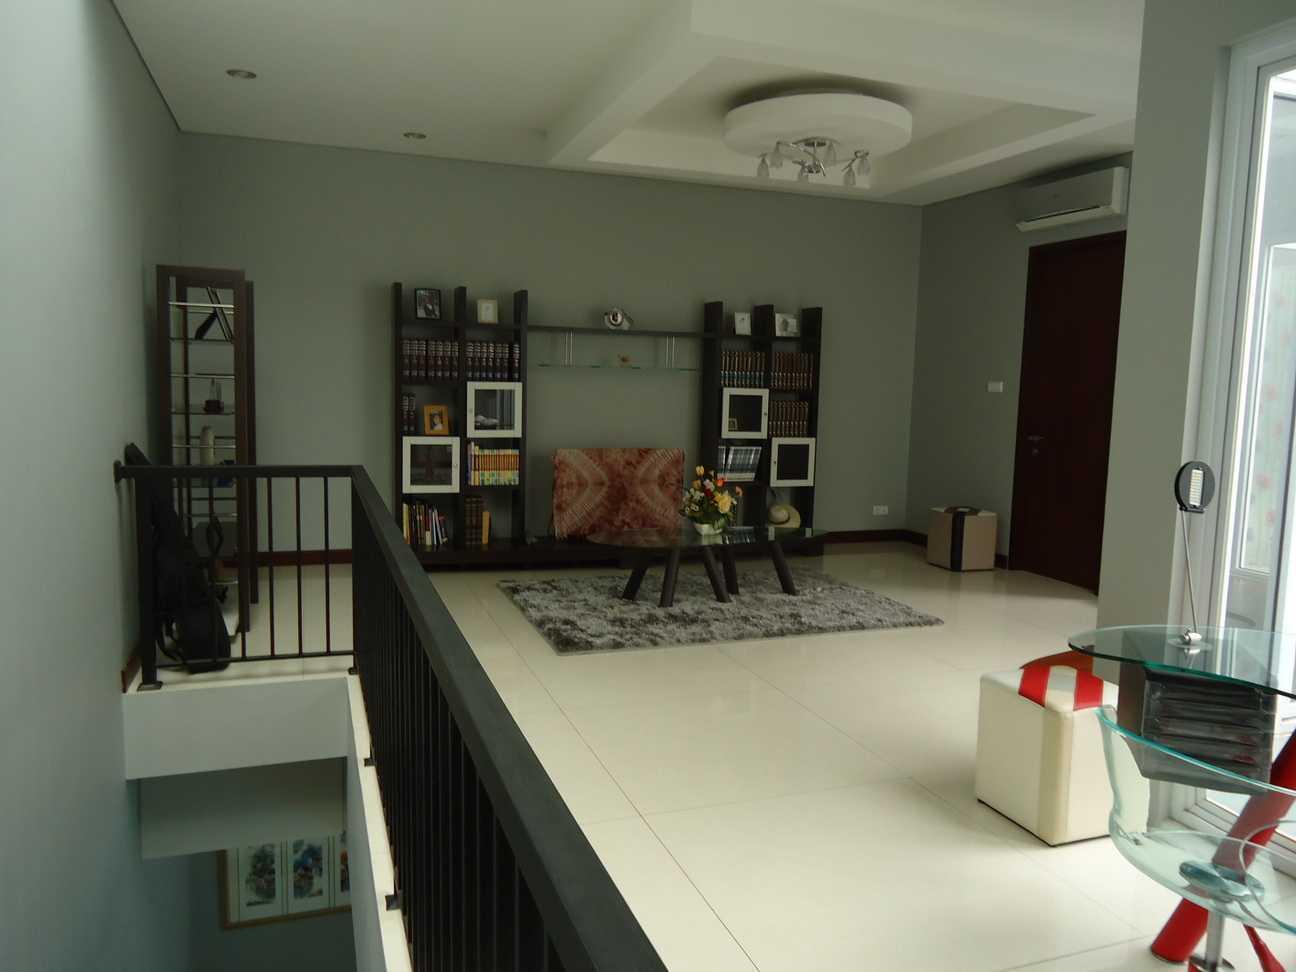 Budi Dharma The Relaxation House Gelong Selatan - Tomang Gelong Selatan - Tomang Gelong-Selatan-01  23850